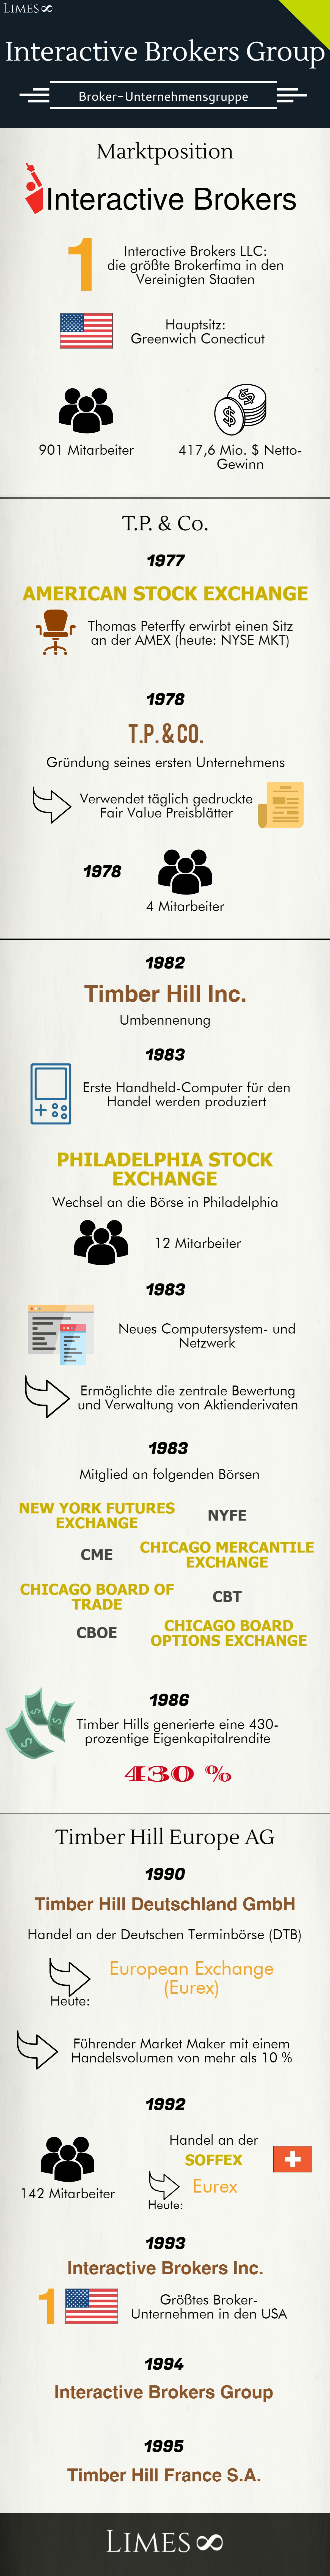 Infografik über die Interactive Brokers Group